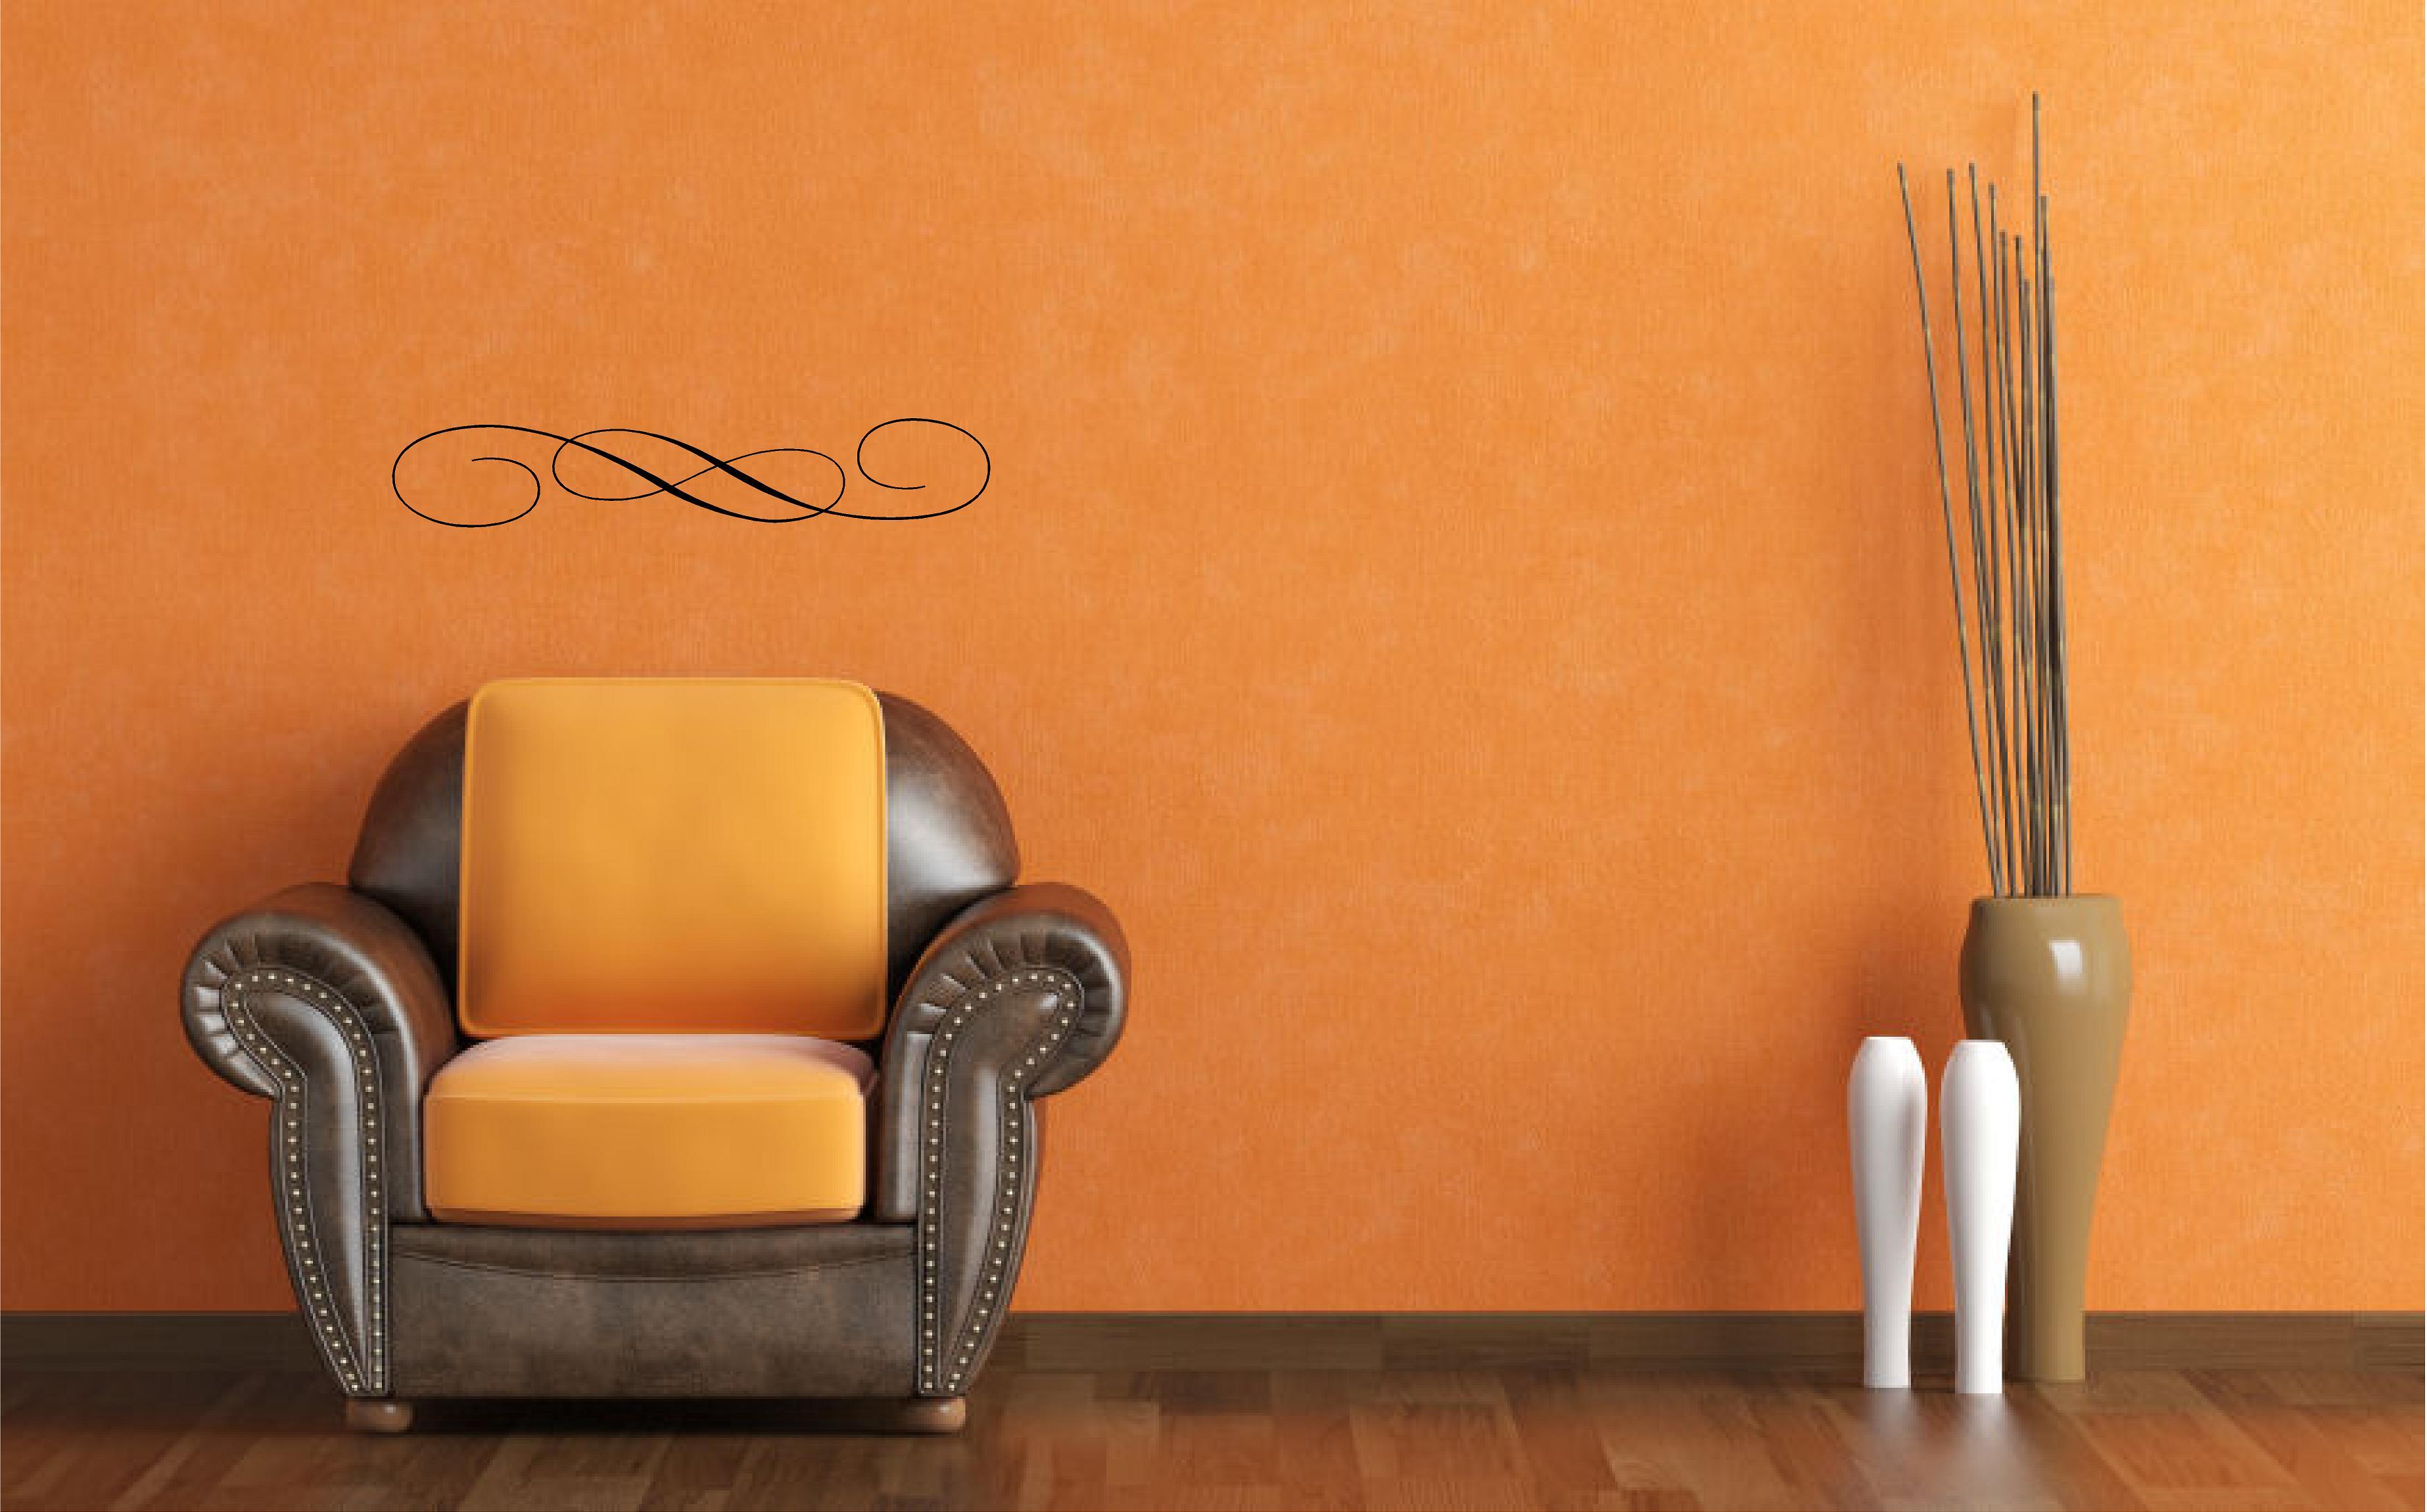 Embellishment Flourish1 Wall Decal